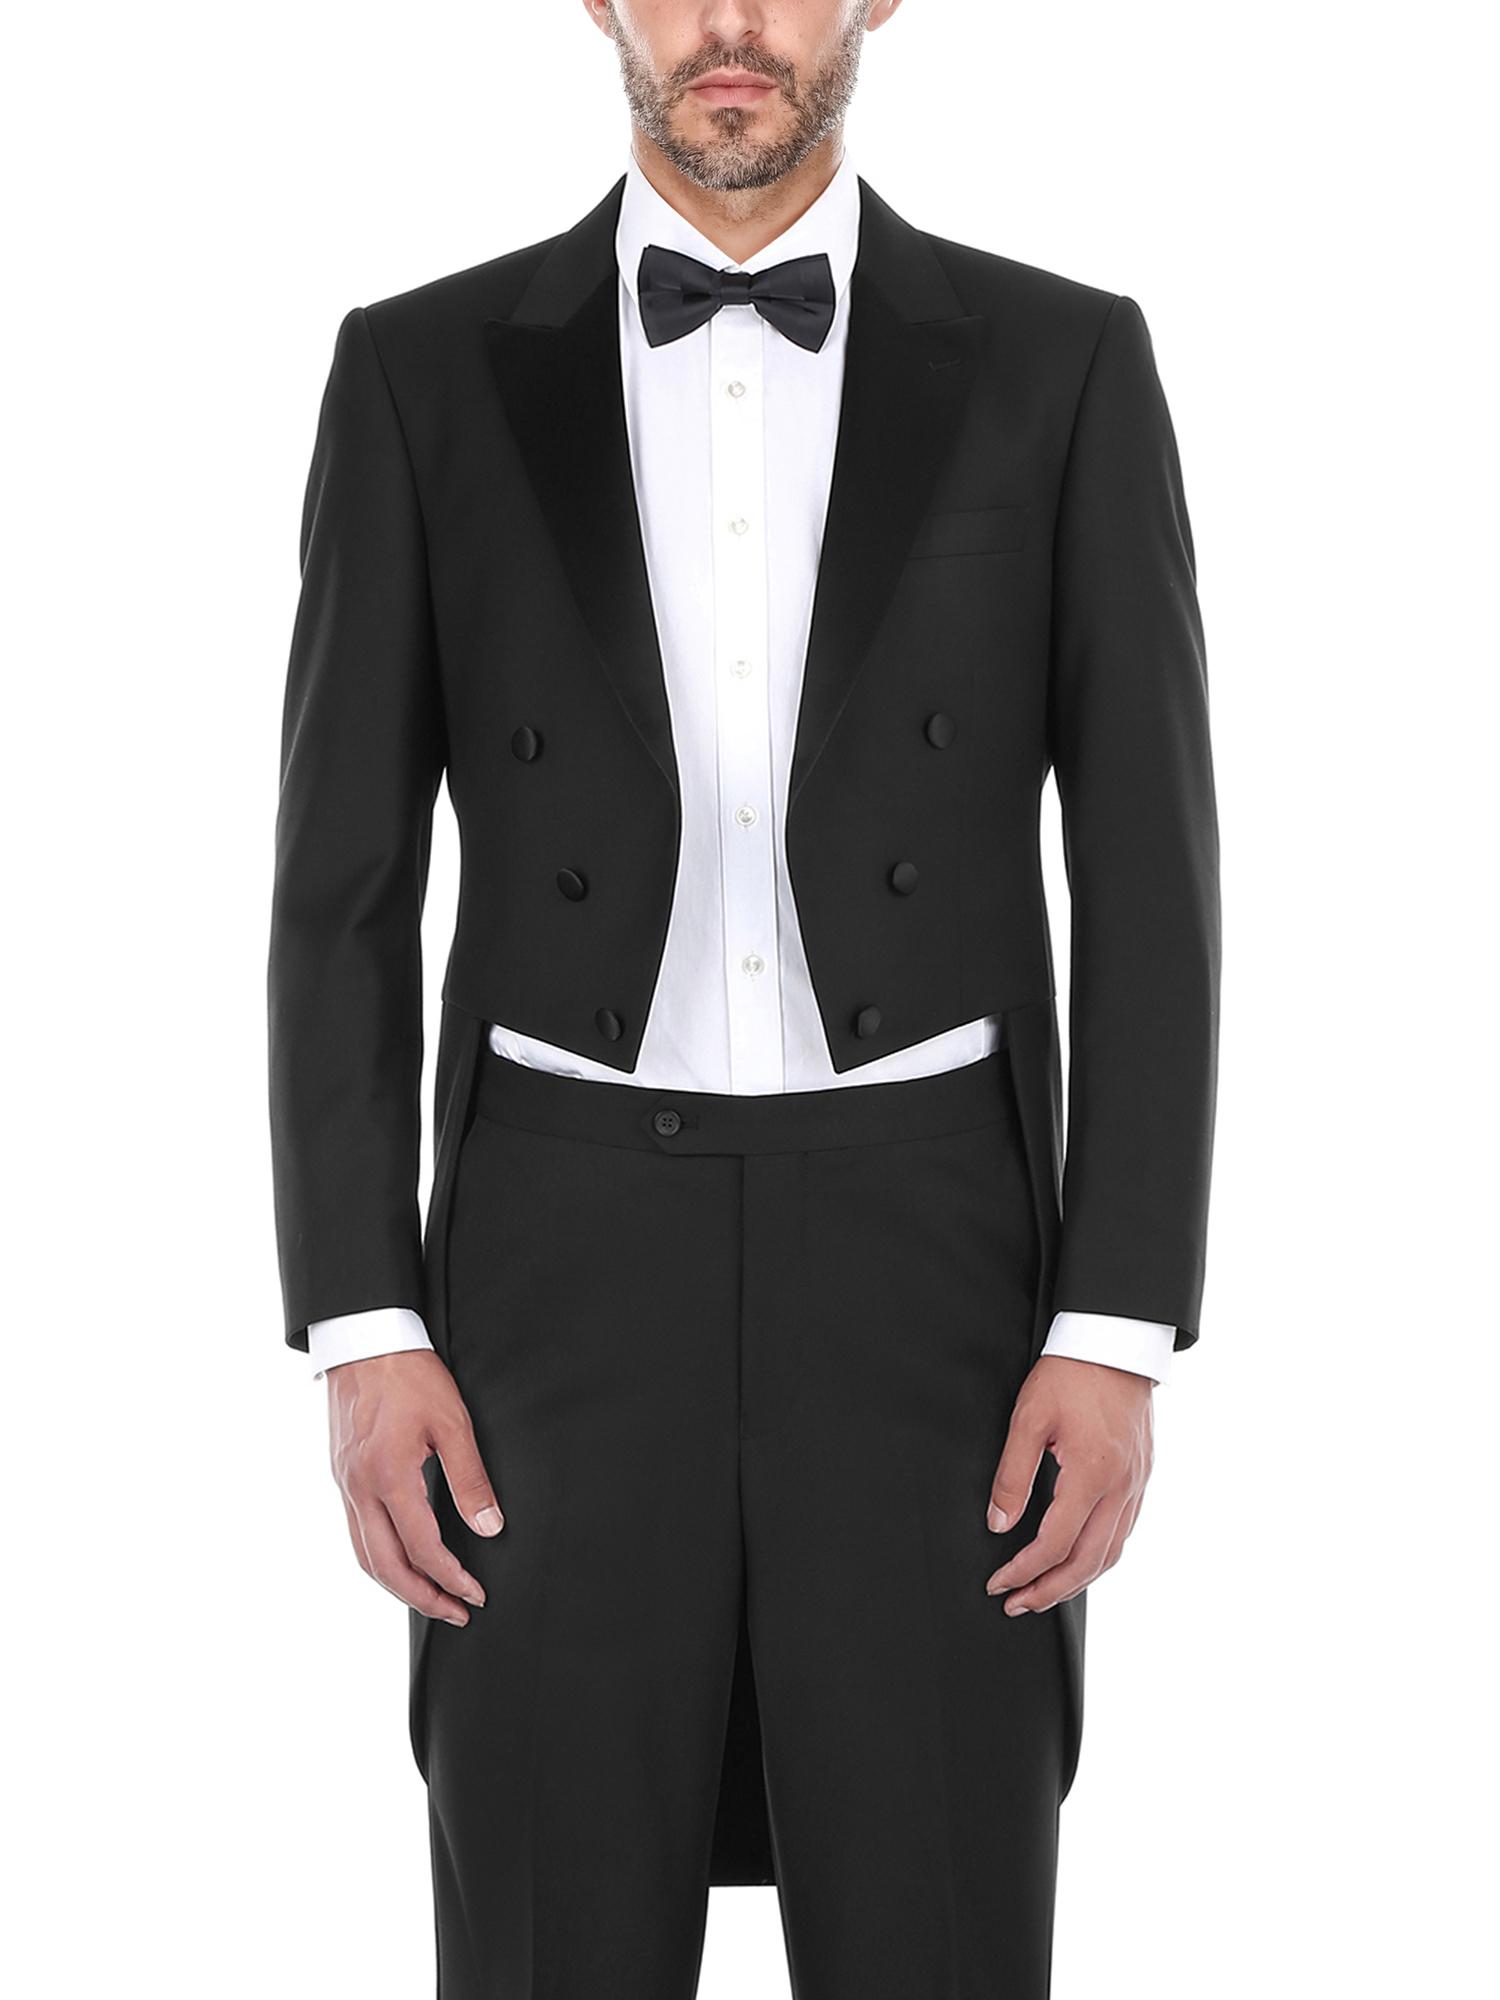 Big Men's Black Classic Fit Peak Lapel Full Dress Two Piece Tuxedo With Tails